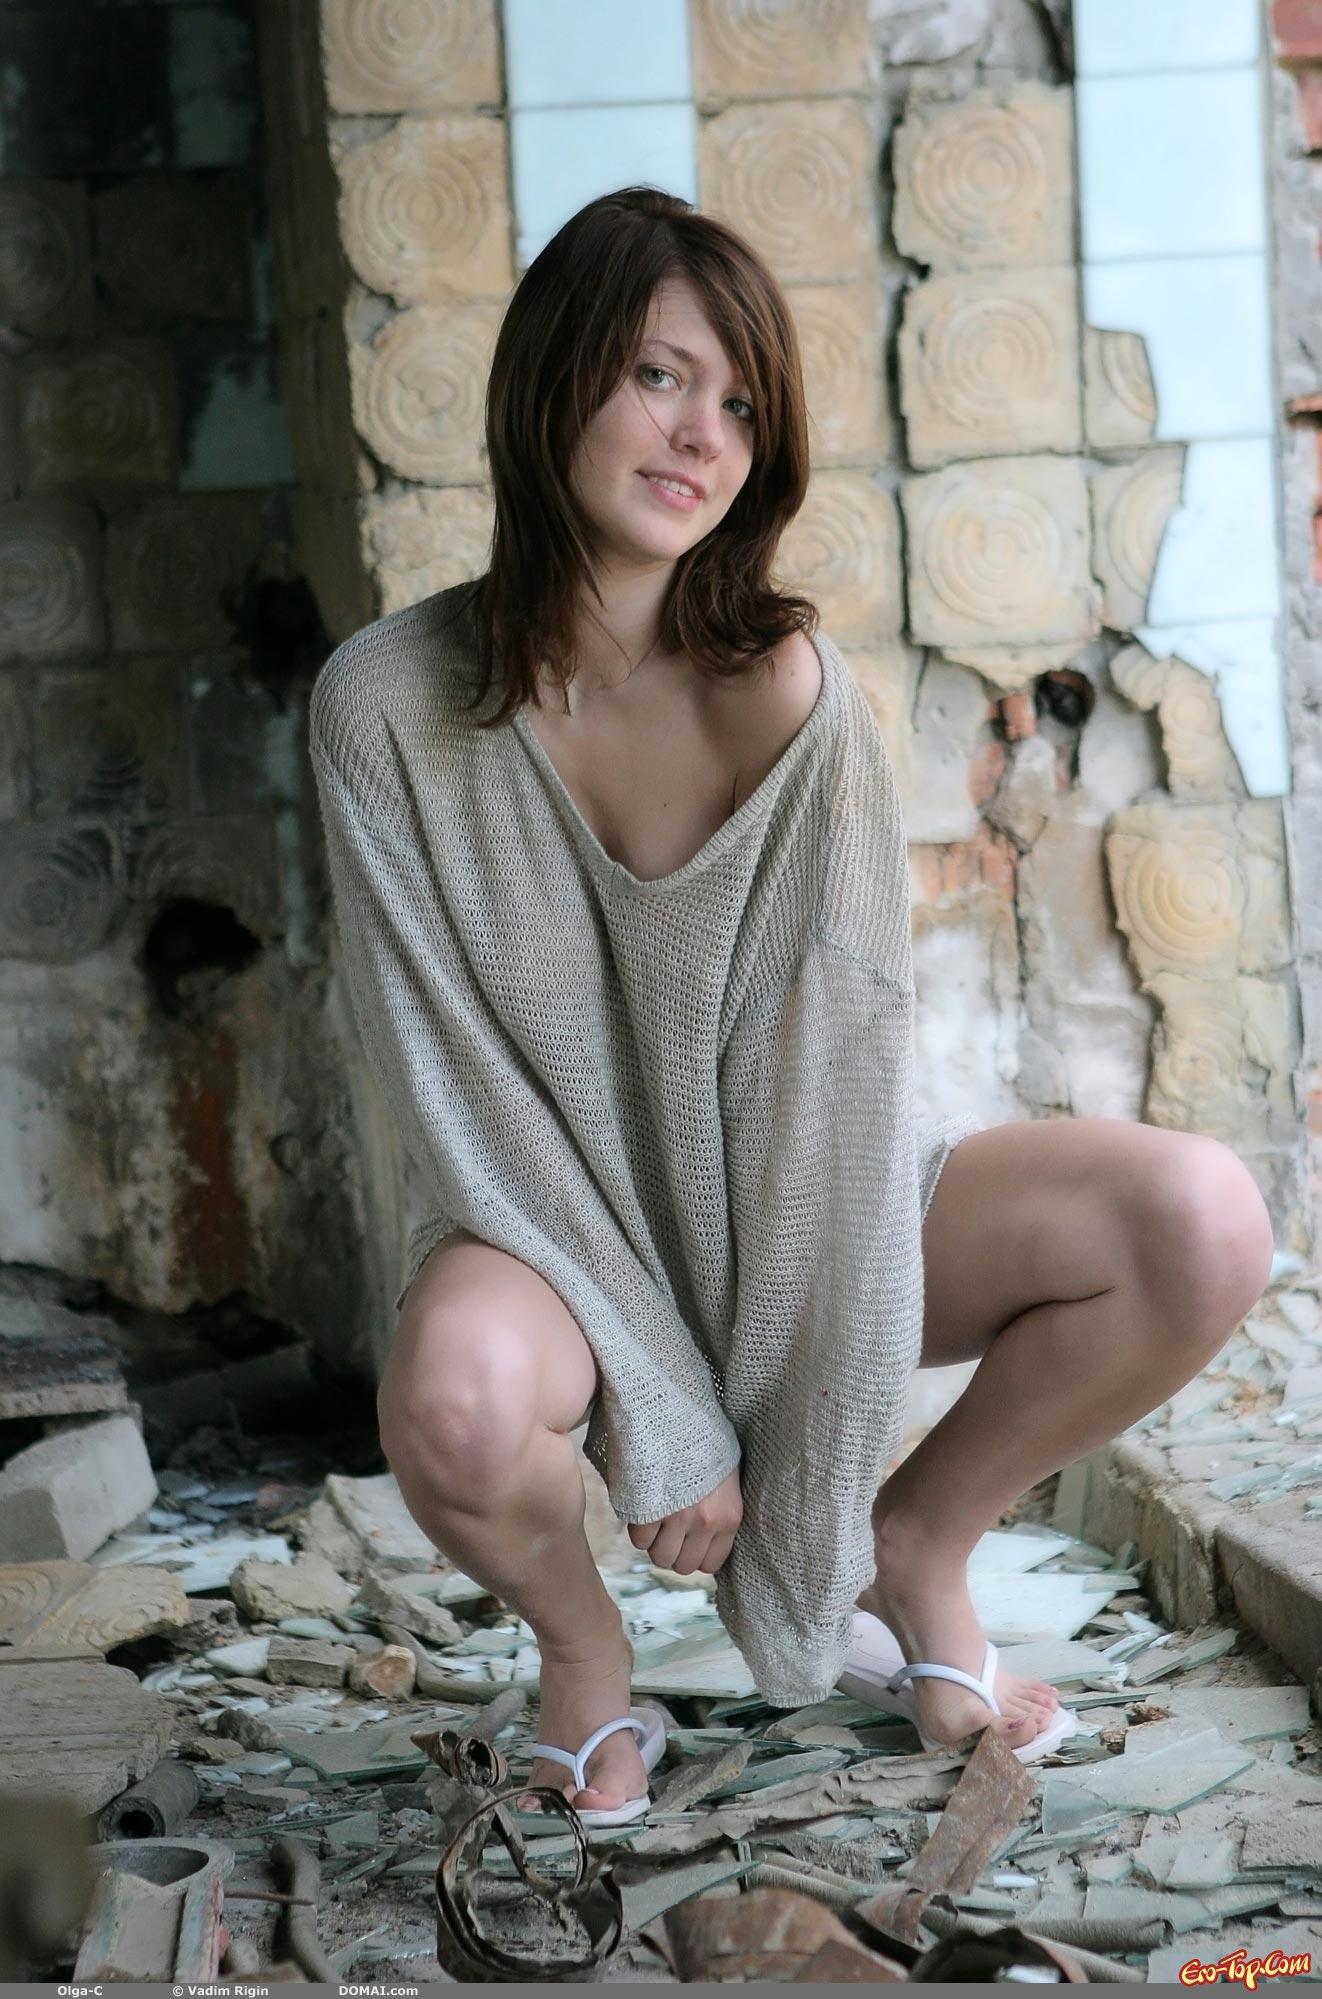 golie-devushki-v-zabroshennih-domah-porno-foto-hudie-telki